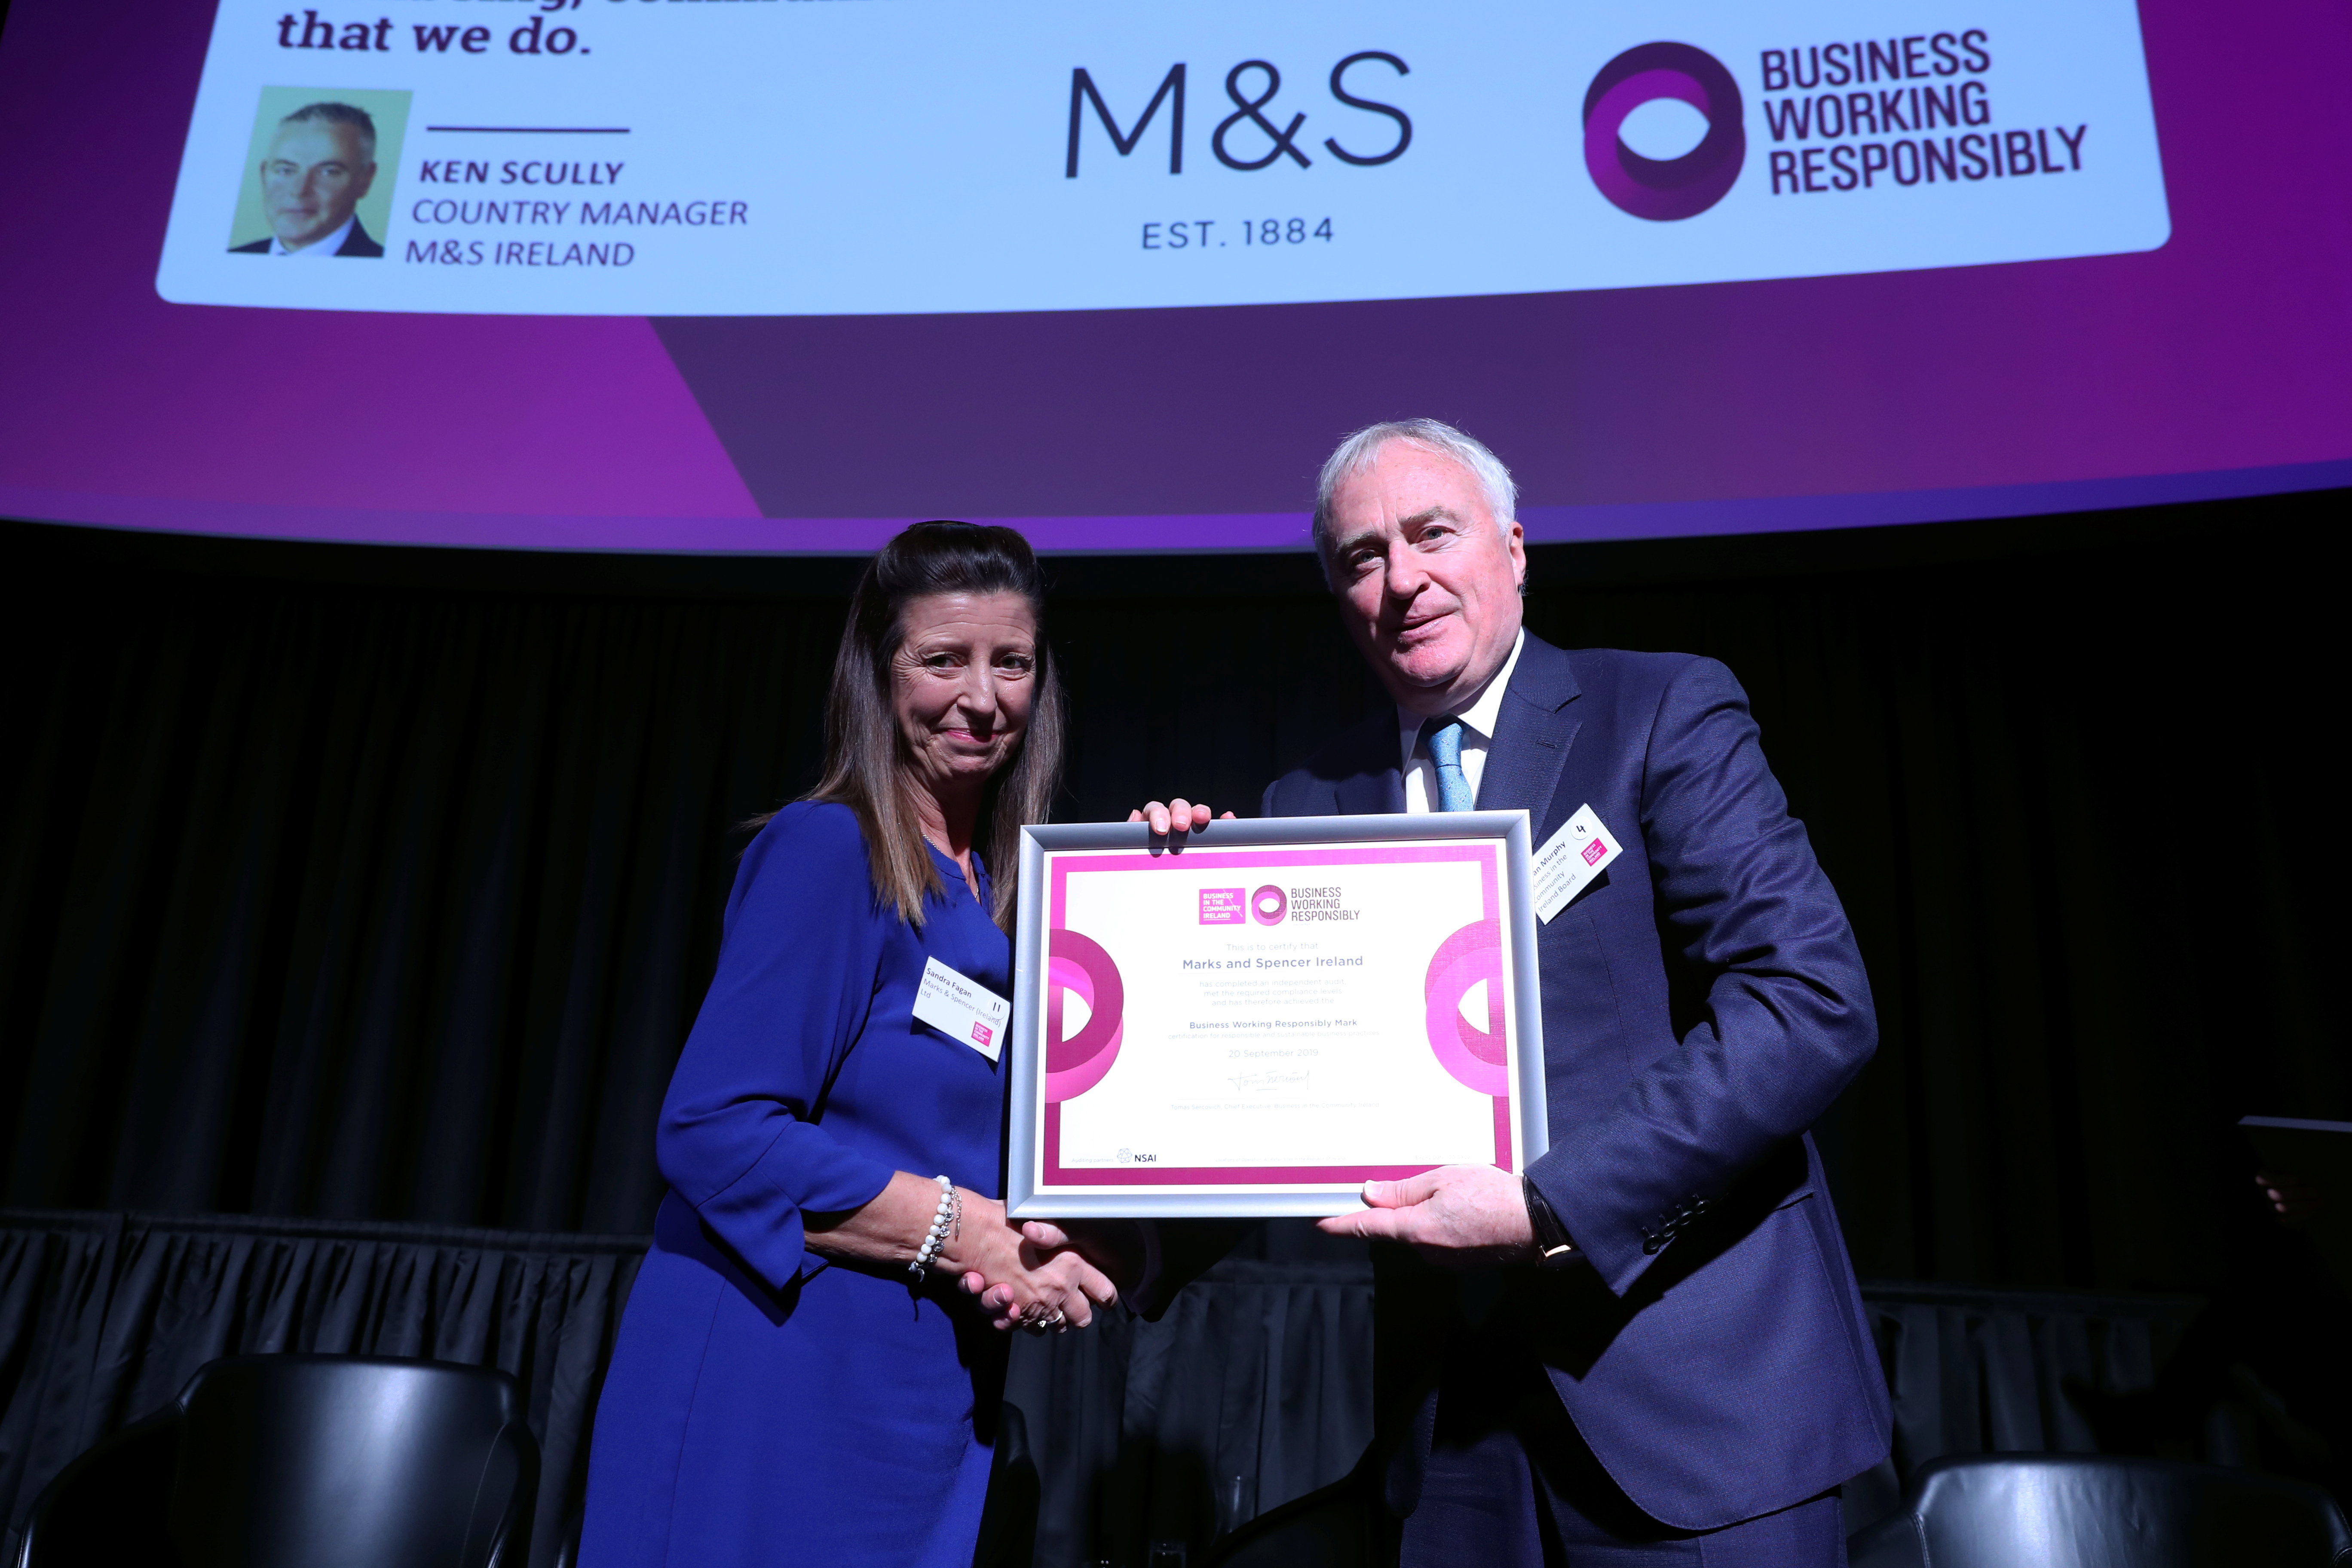 Sandra Fagan M&S Business Working Responsibly mark